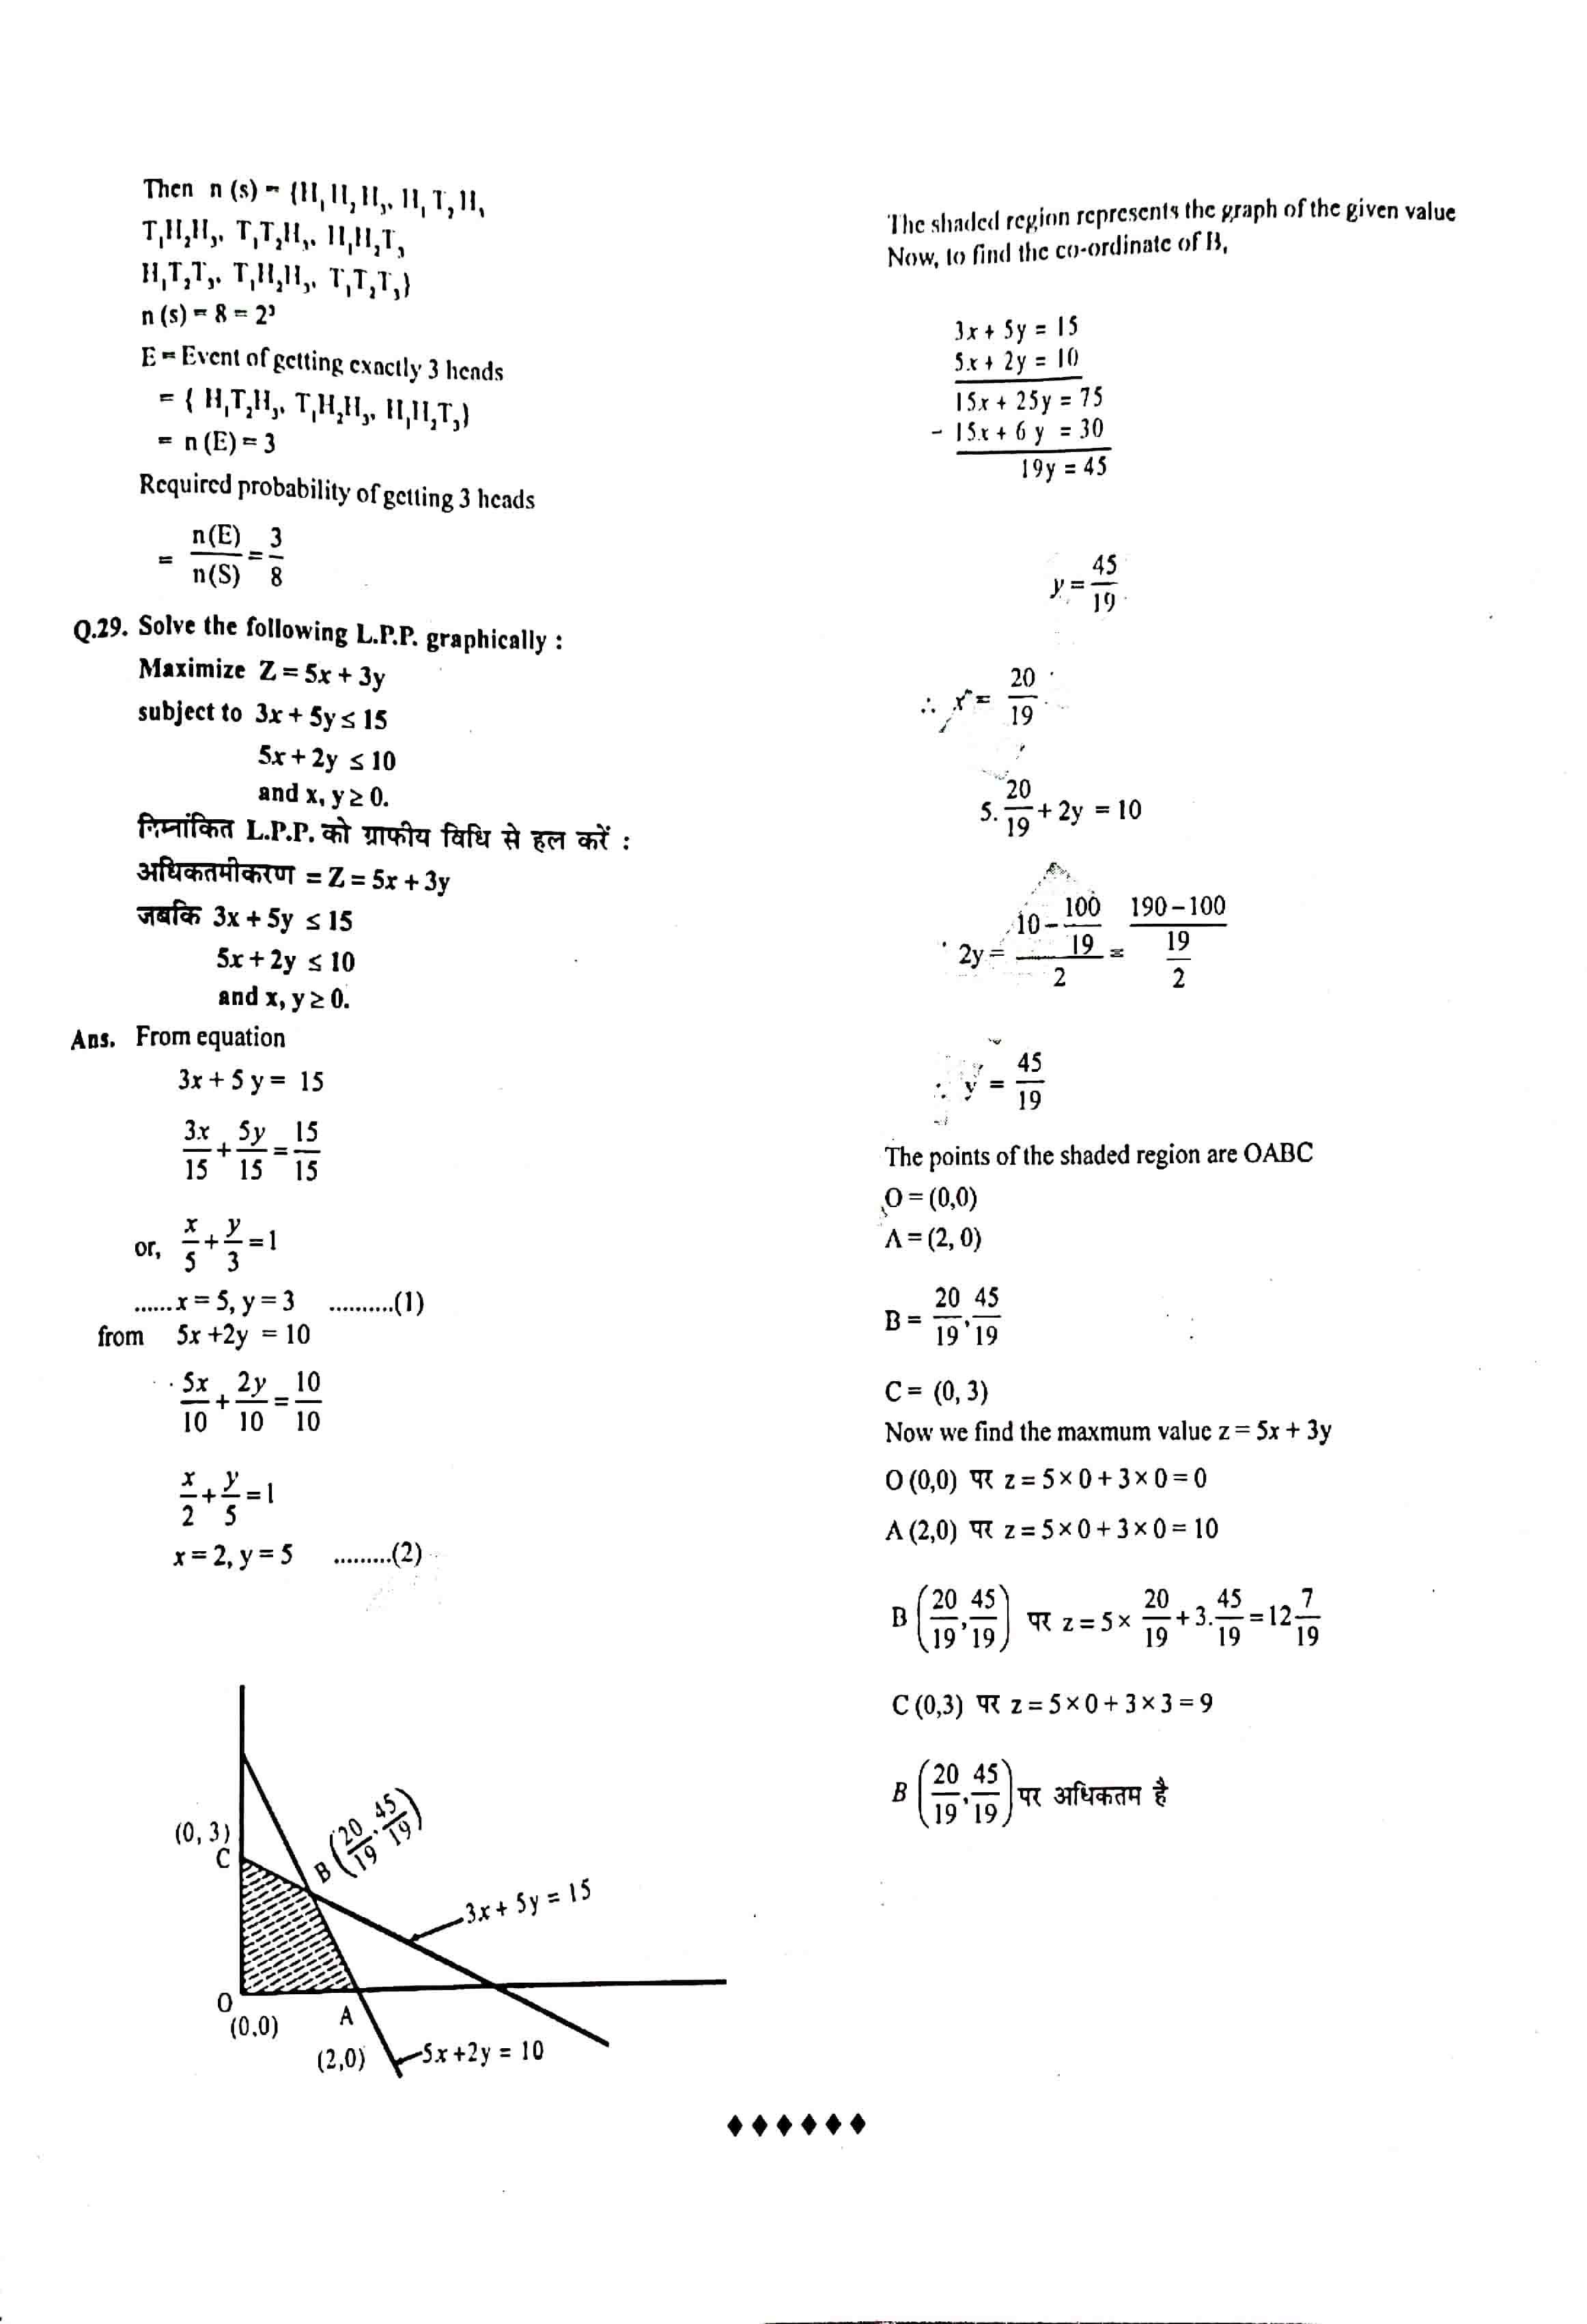 JAC Class 12 math 2013 Question Paper 09